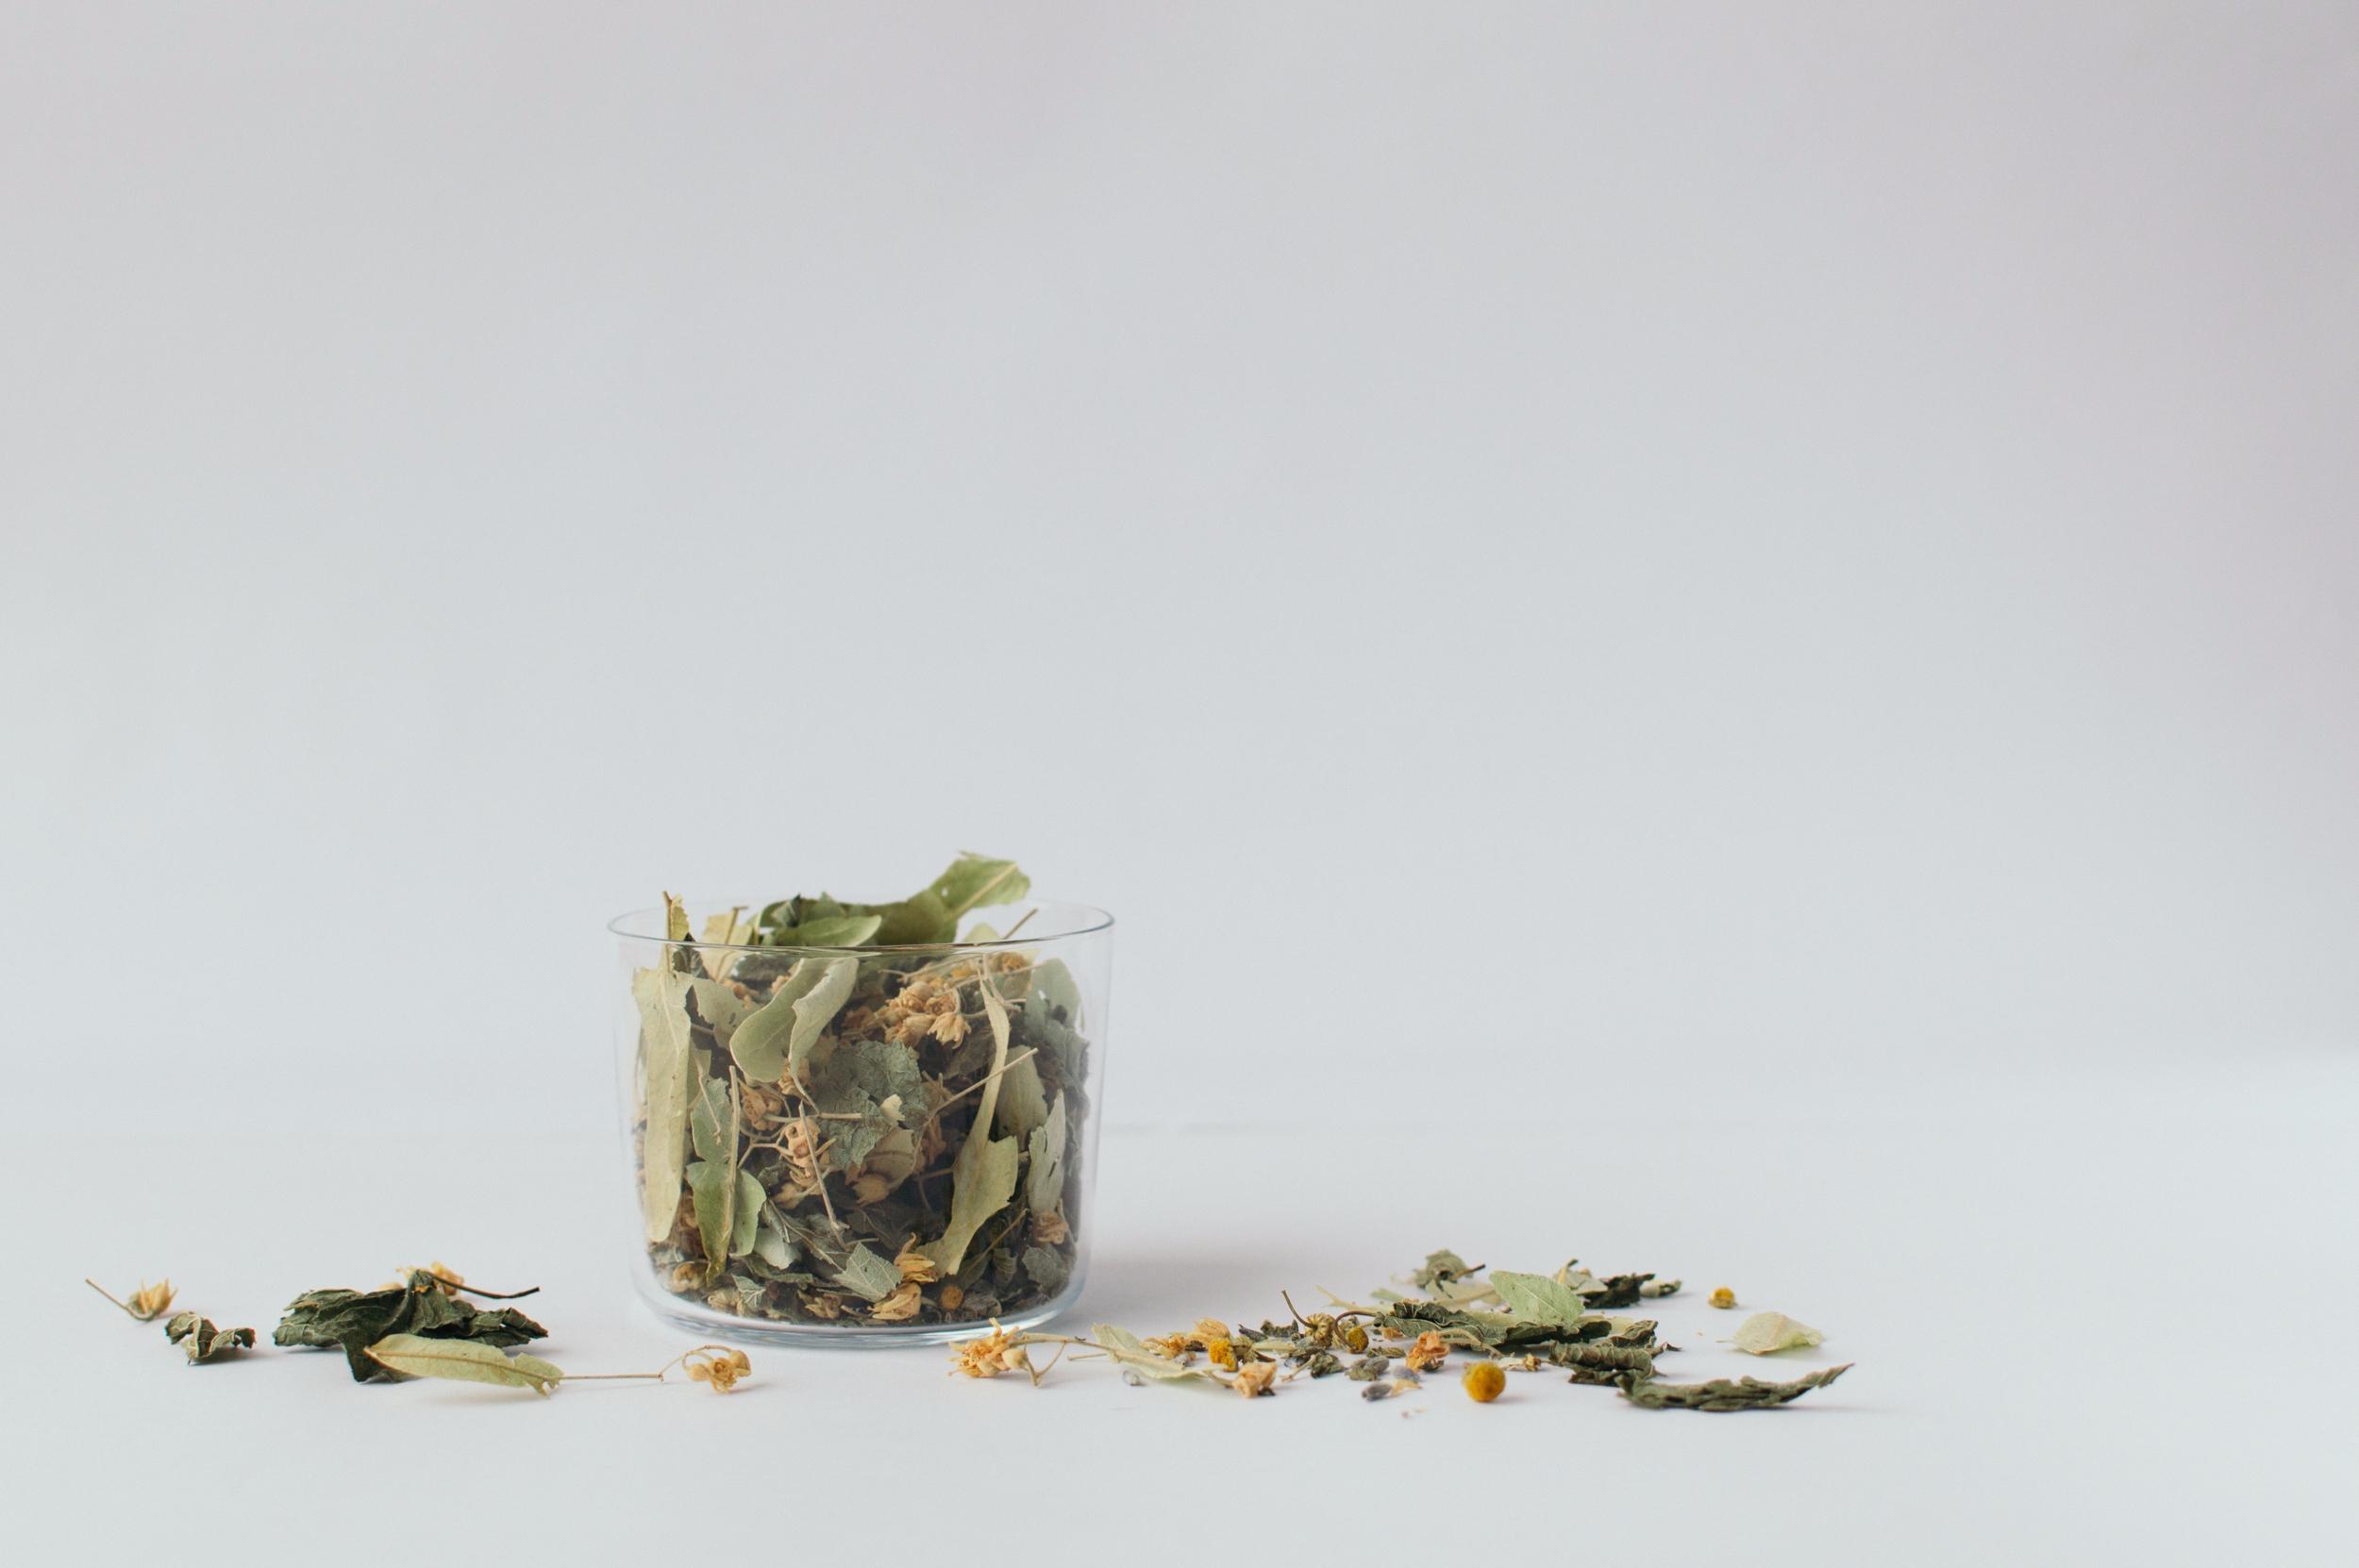 SEA - organic herbal tea blend  - rhoeco_fineorganicgoods | ello